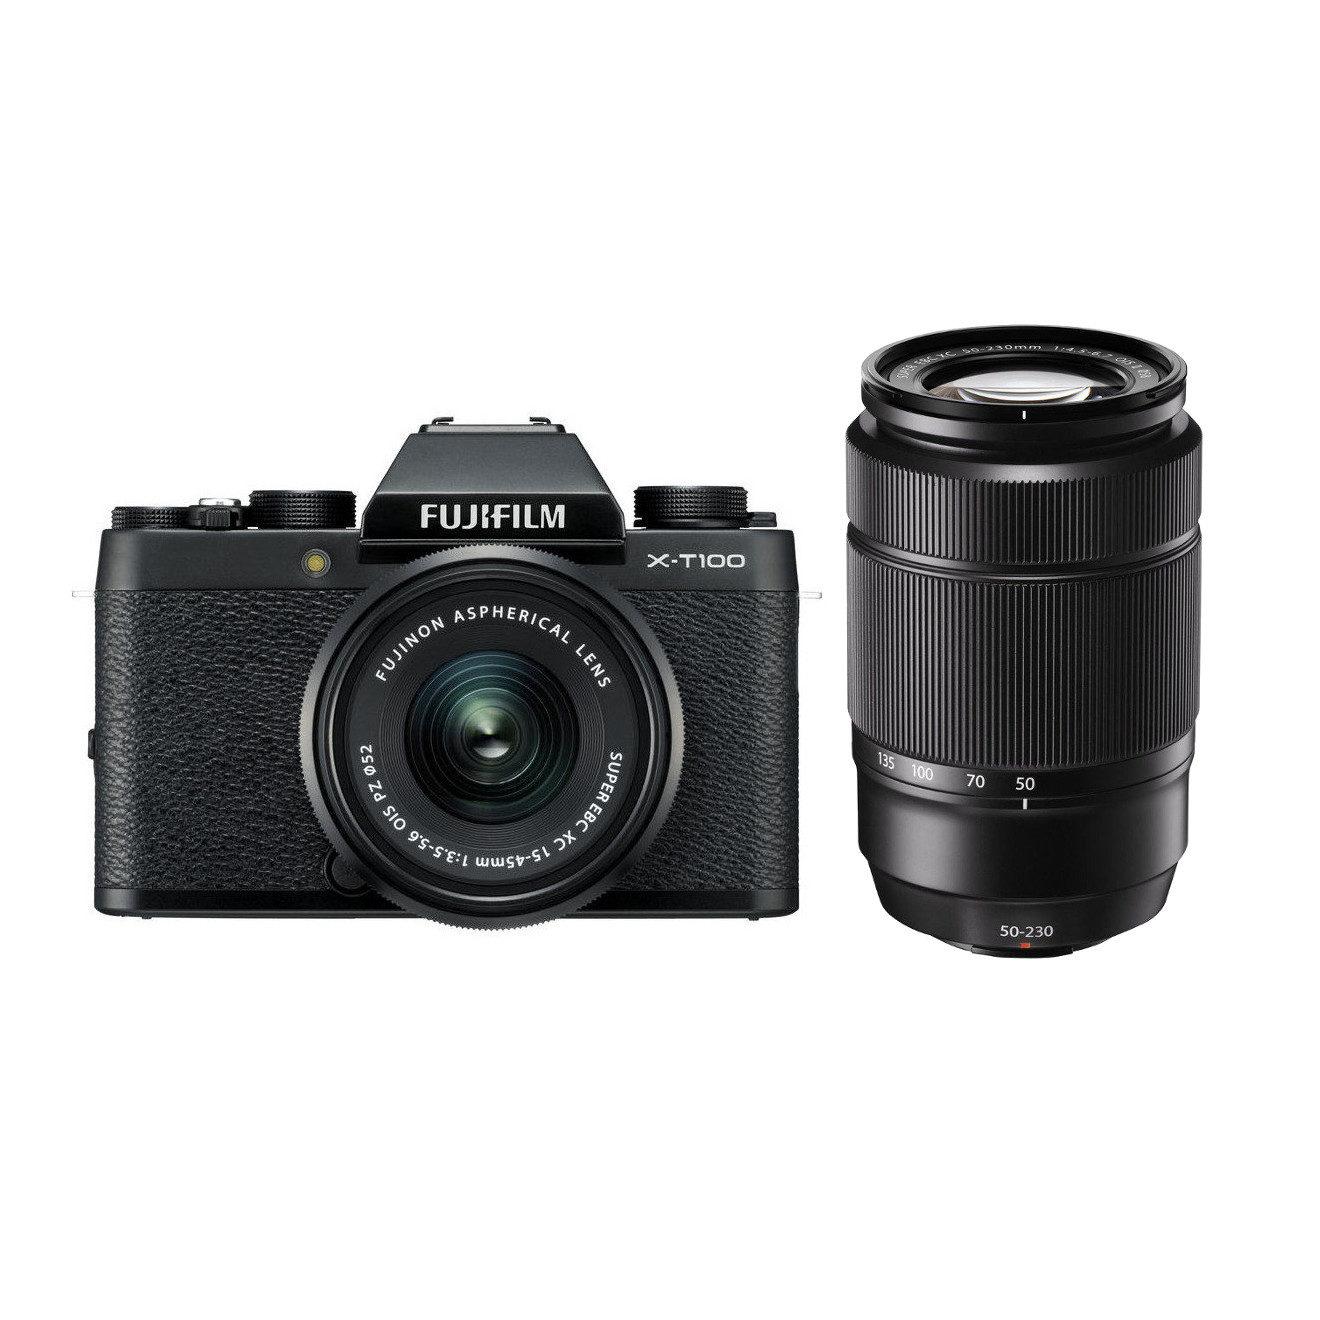 Fujifilm X-T100 systeemcamera Zwart + XC 15-45mm + XC 50-230mm <br/>€ 699.00 <br/> <a href='https://www.cameranu.nl/fotografie/?tt=12190_474631_241358_&r=https%3A%2F%2Fwww.cameranu.nl%2Fnl%2Fp2635675%2Ffujifilm-x-t100-systeemcamera-zwart-xc-15-45mm-xc-50-230mm%3Fchannable%3De10841.MjYzNTY3NQ%26utm_campaign%3D%26utm_content%3DSysteemcamera%26utm_source%3DTradetracker%26utm_medium%3Dcpc%26utm_term%3DDigitale%2Bcamera%26apos%3Bs' target='_blank'>naar de winkel</a>